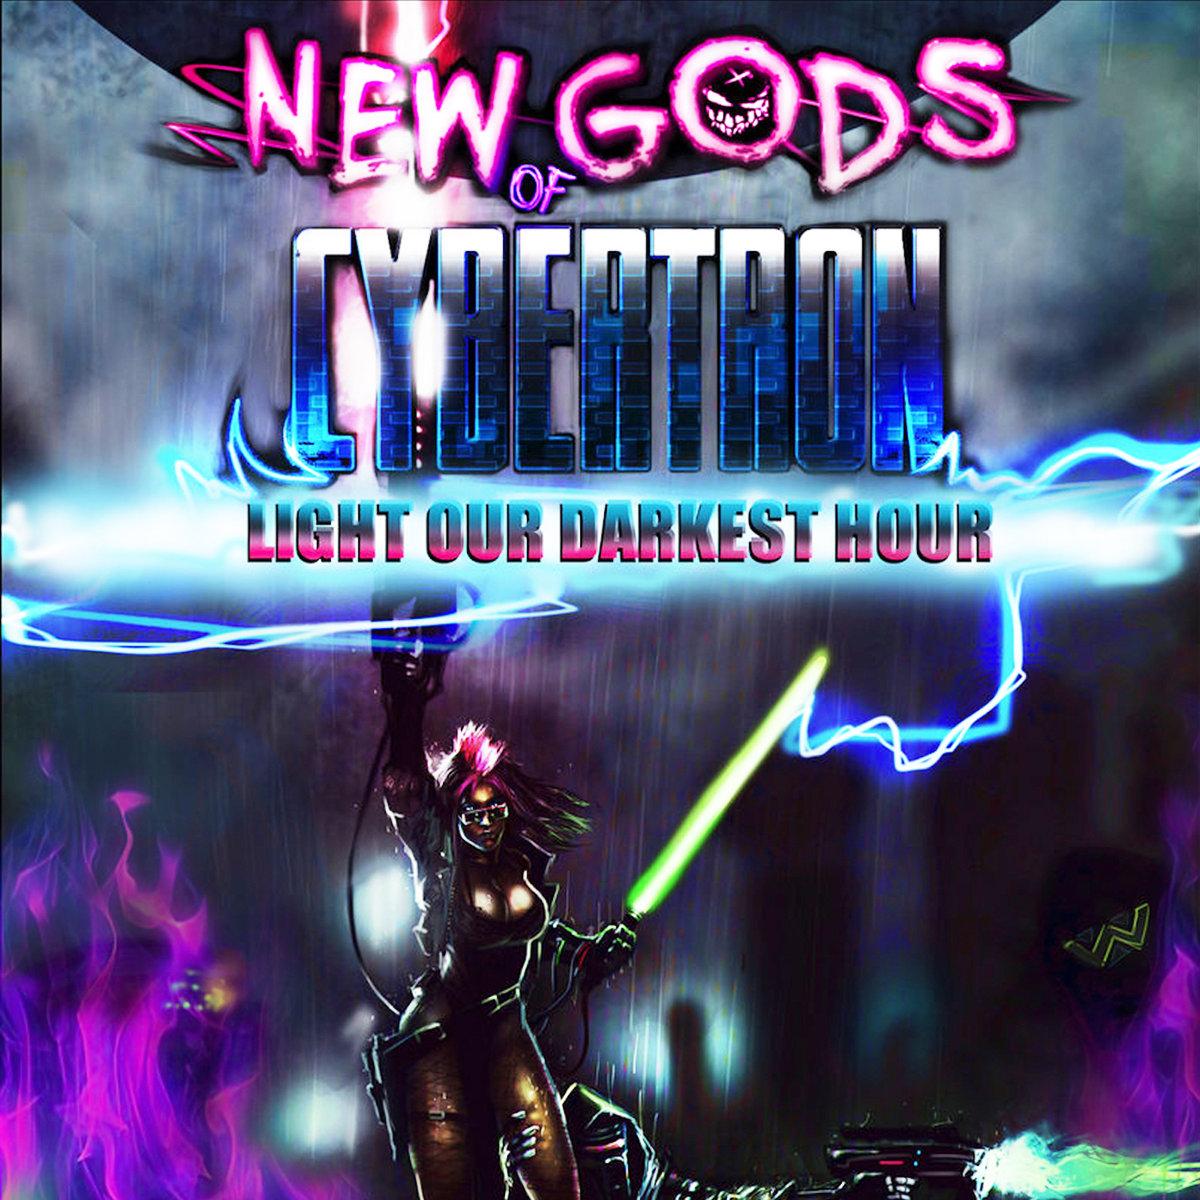 New Gods of Cybertron